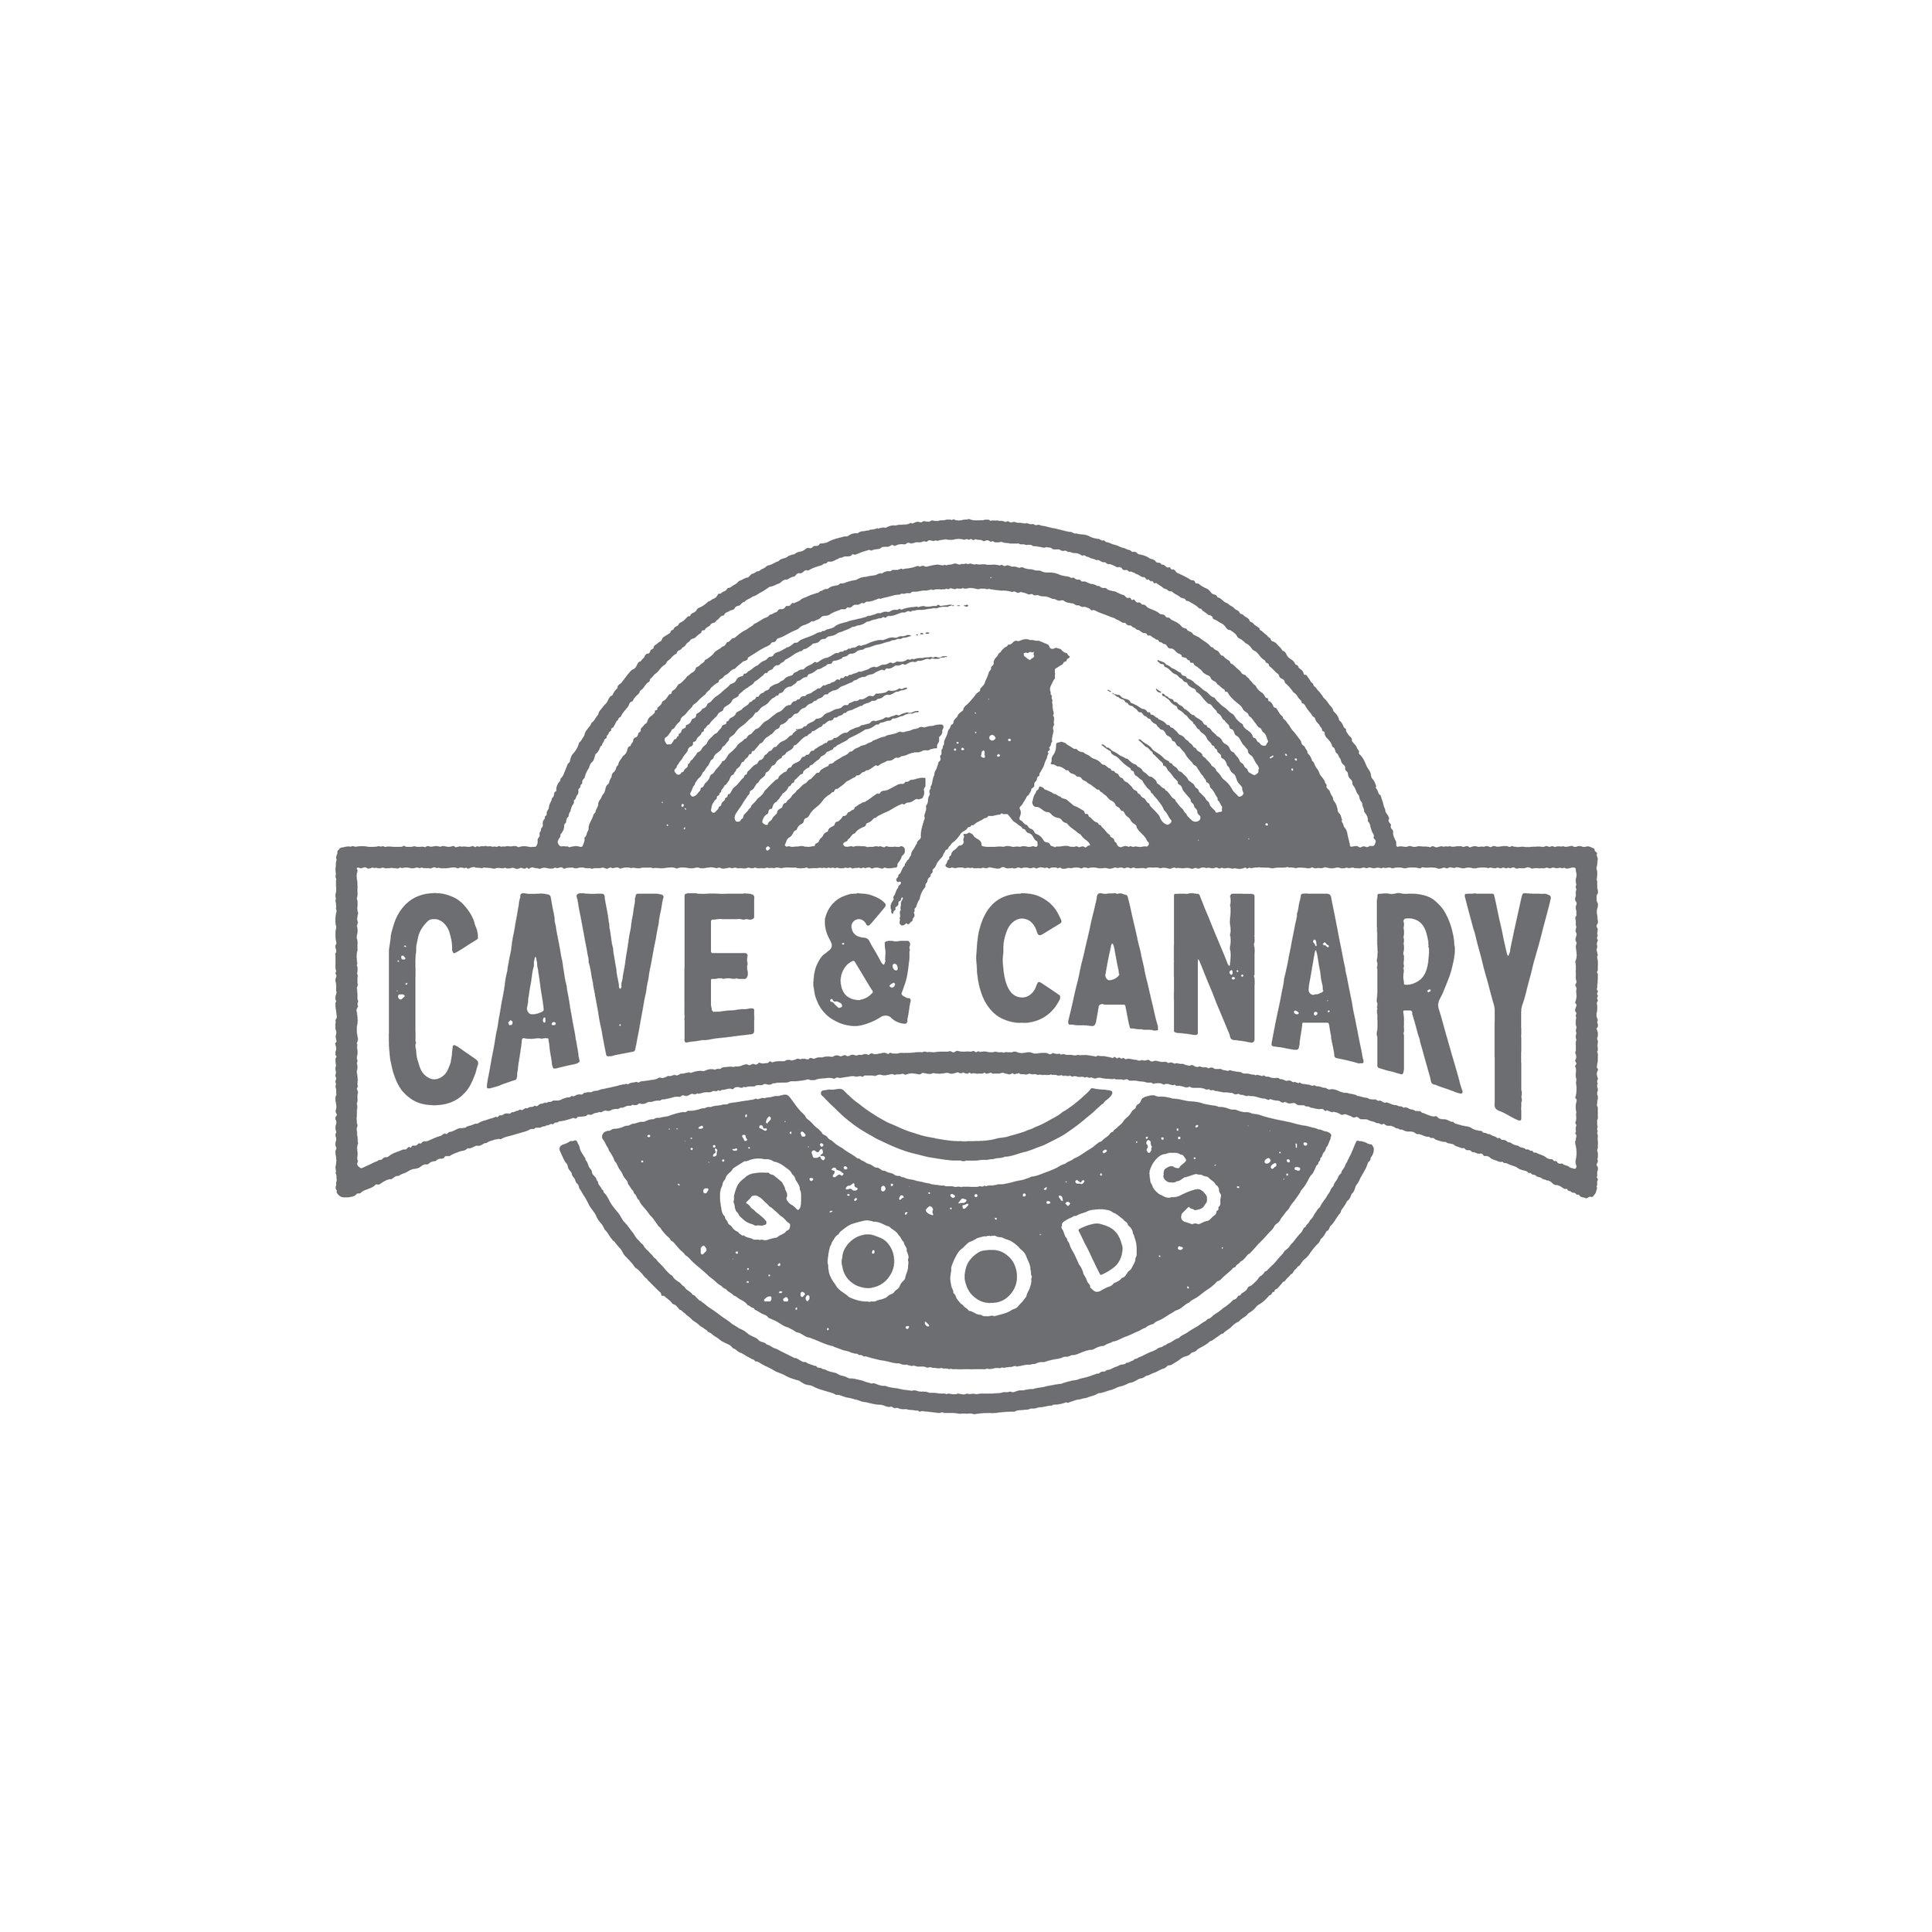 Cave&Canary-01.jpg